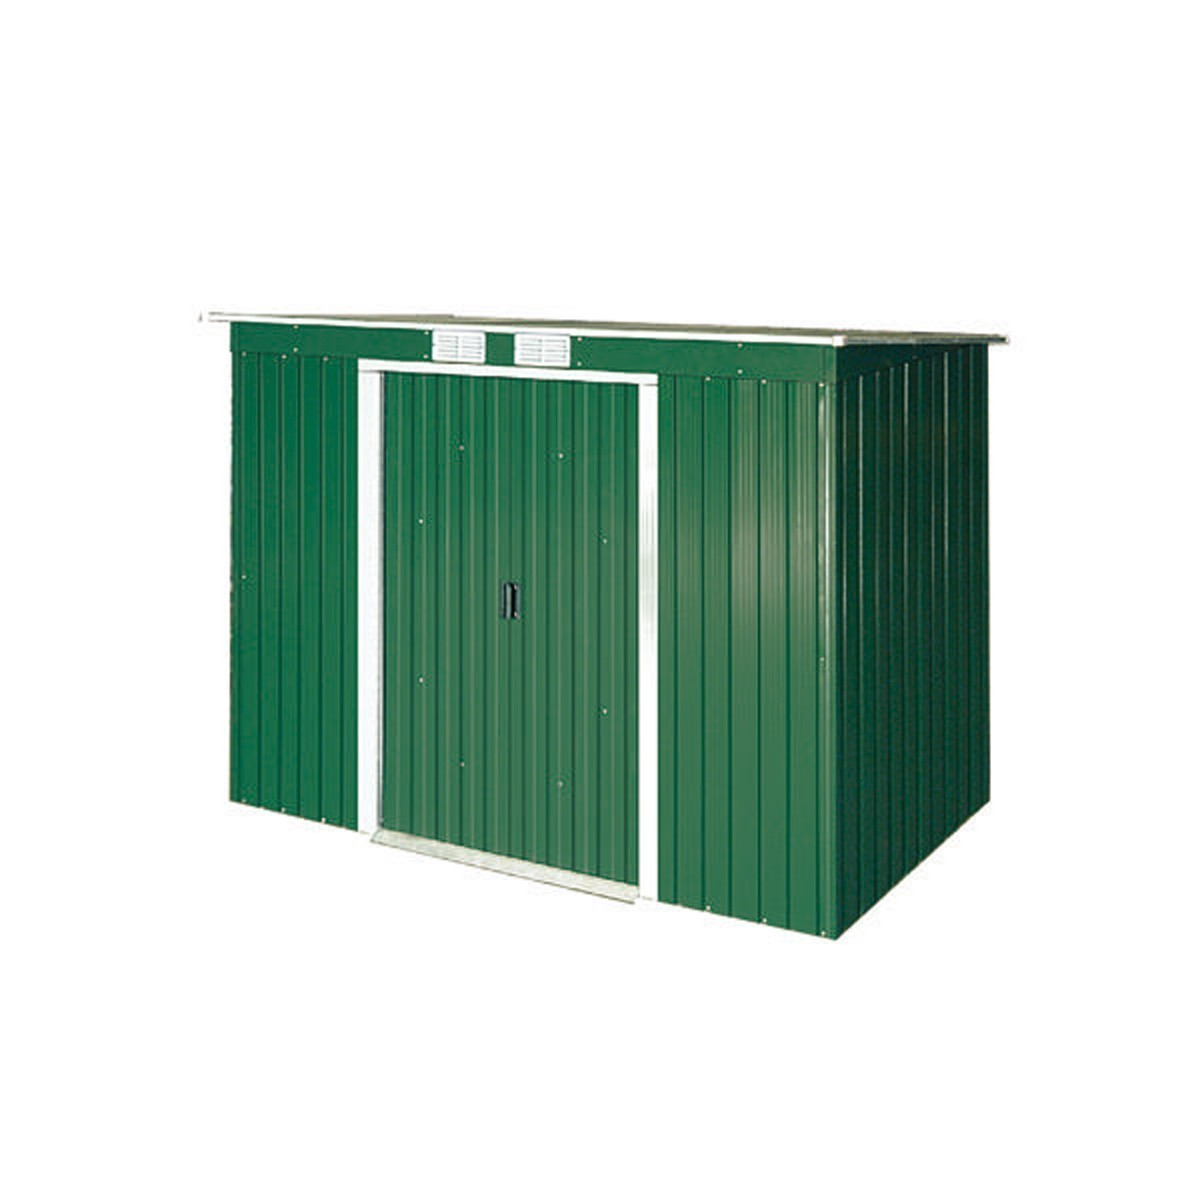 duramax ger tehaus metall pultdach pent roof 8x4 gr n. Black Bedroom Furniture Sets. Home Design Ideas